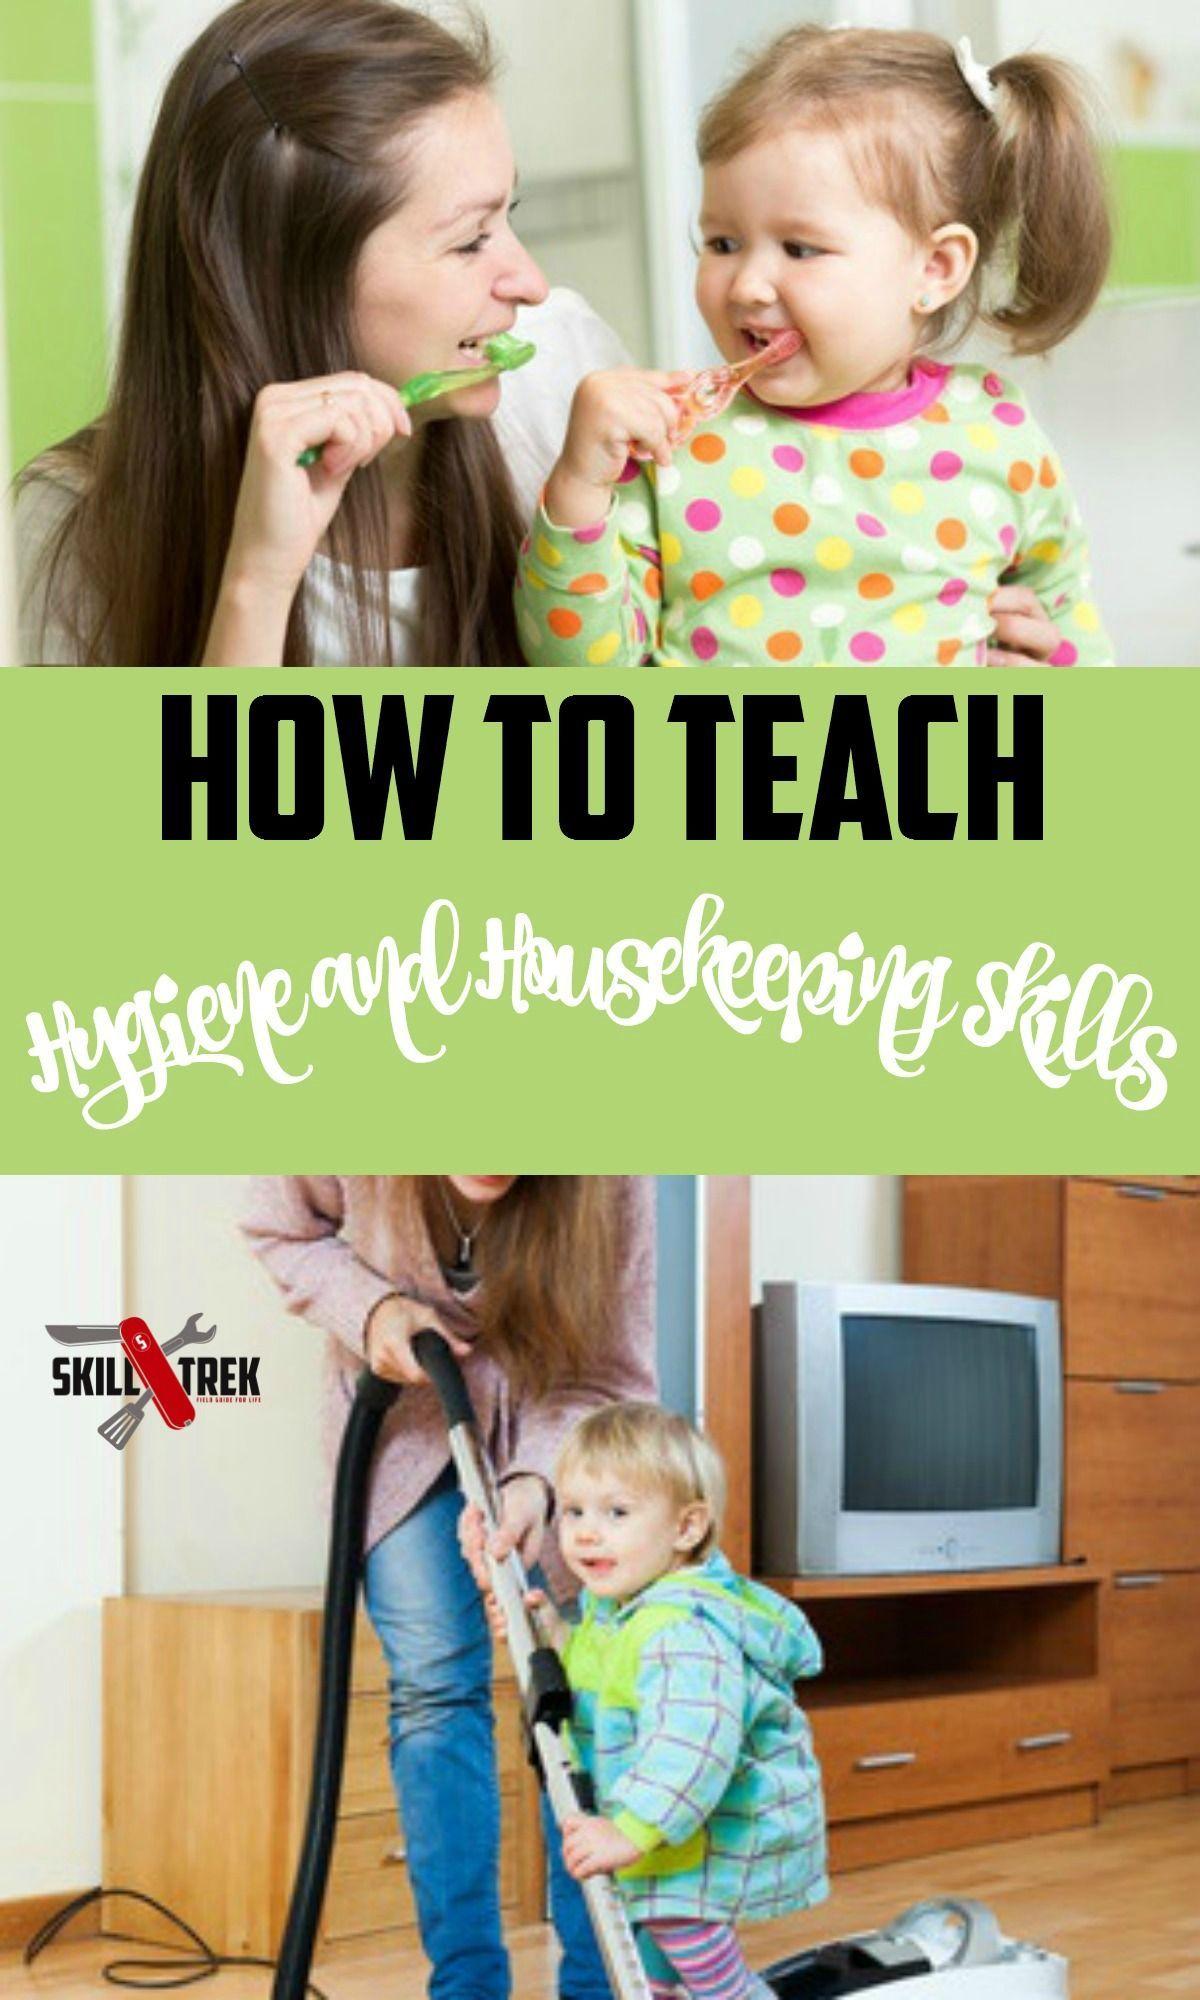 How To Teach Hygiene And Housekeeping Skills